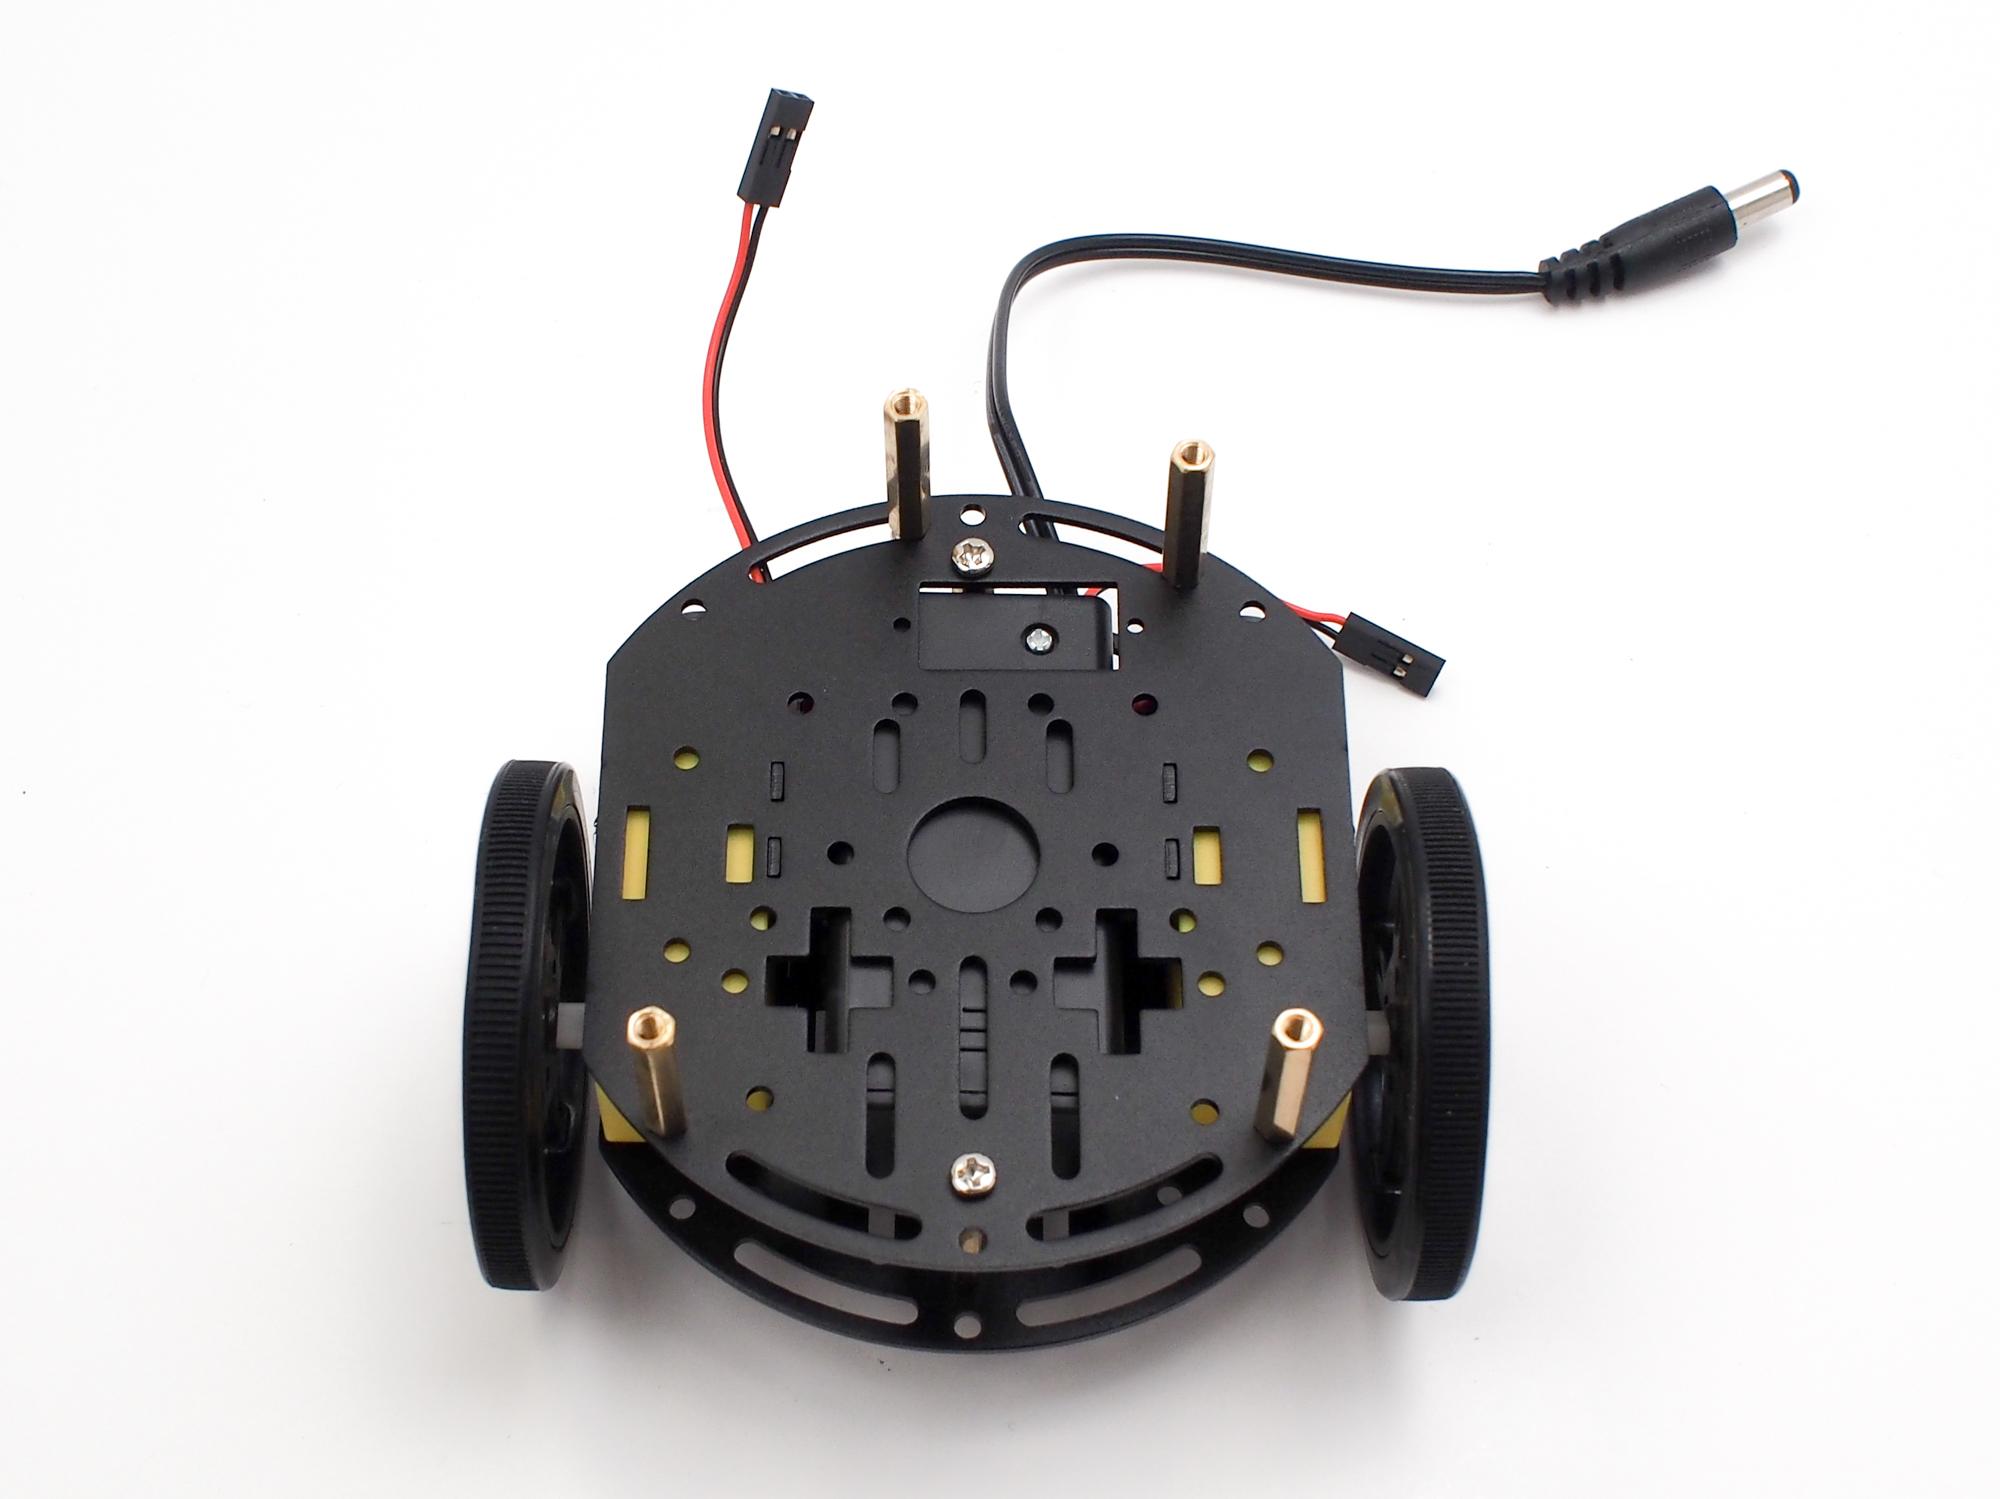 robotics_learn_arduino_P2080045_2k.jpg